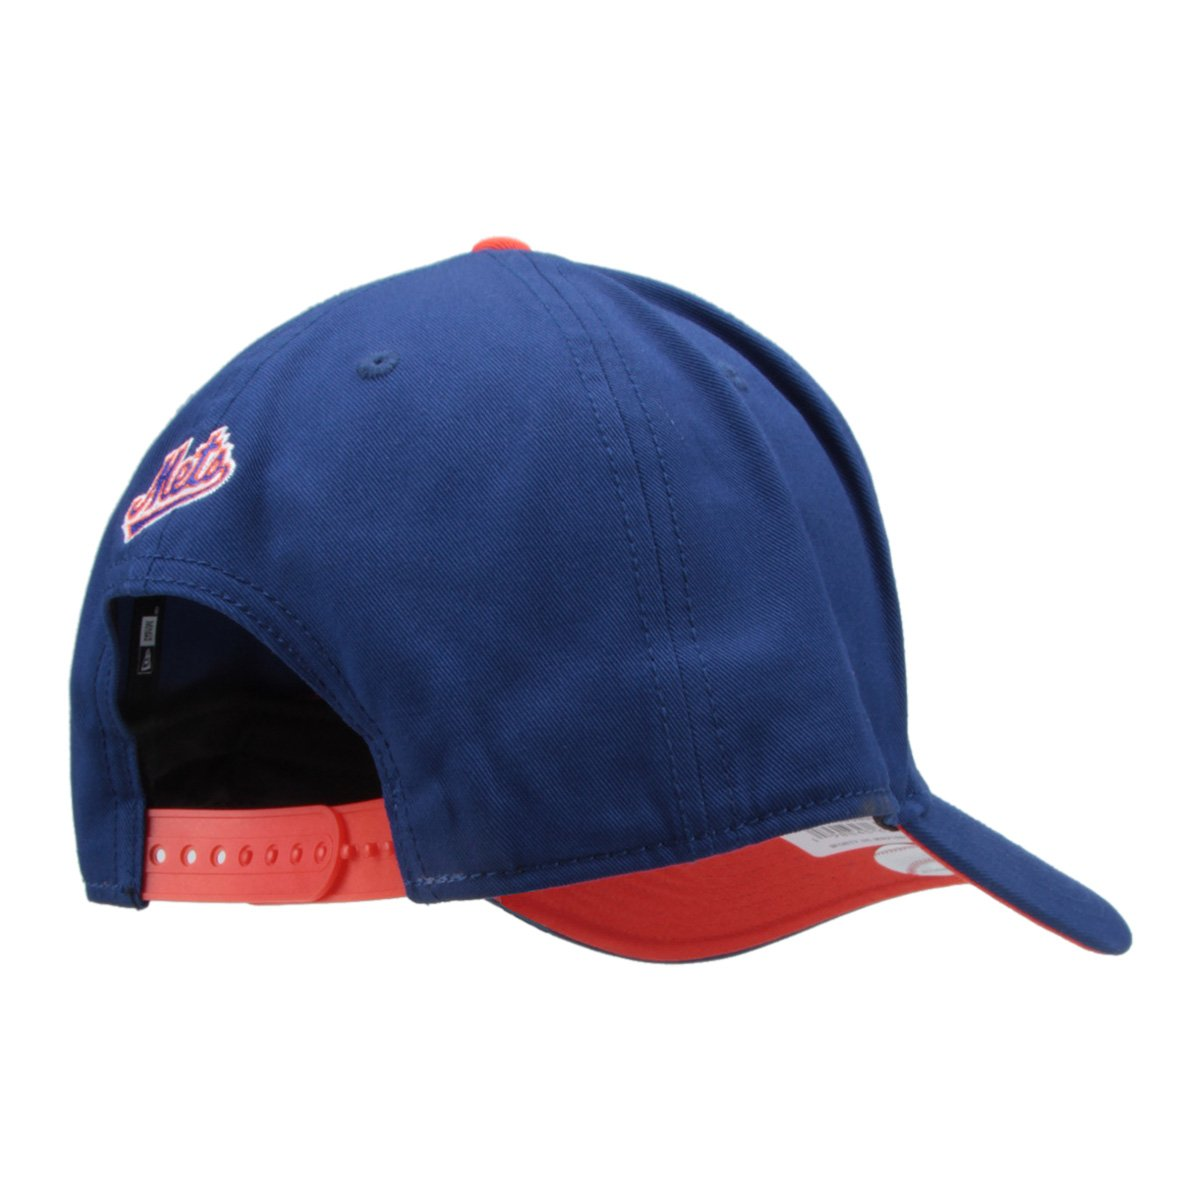 Boné New Era MLB New York Mets Aba Curva 940 Hp Sn Basic Coop ... 9f7d2e78f68